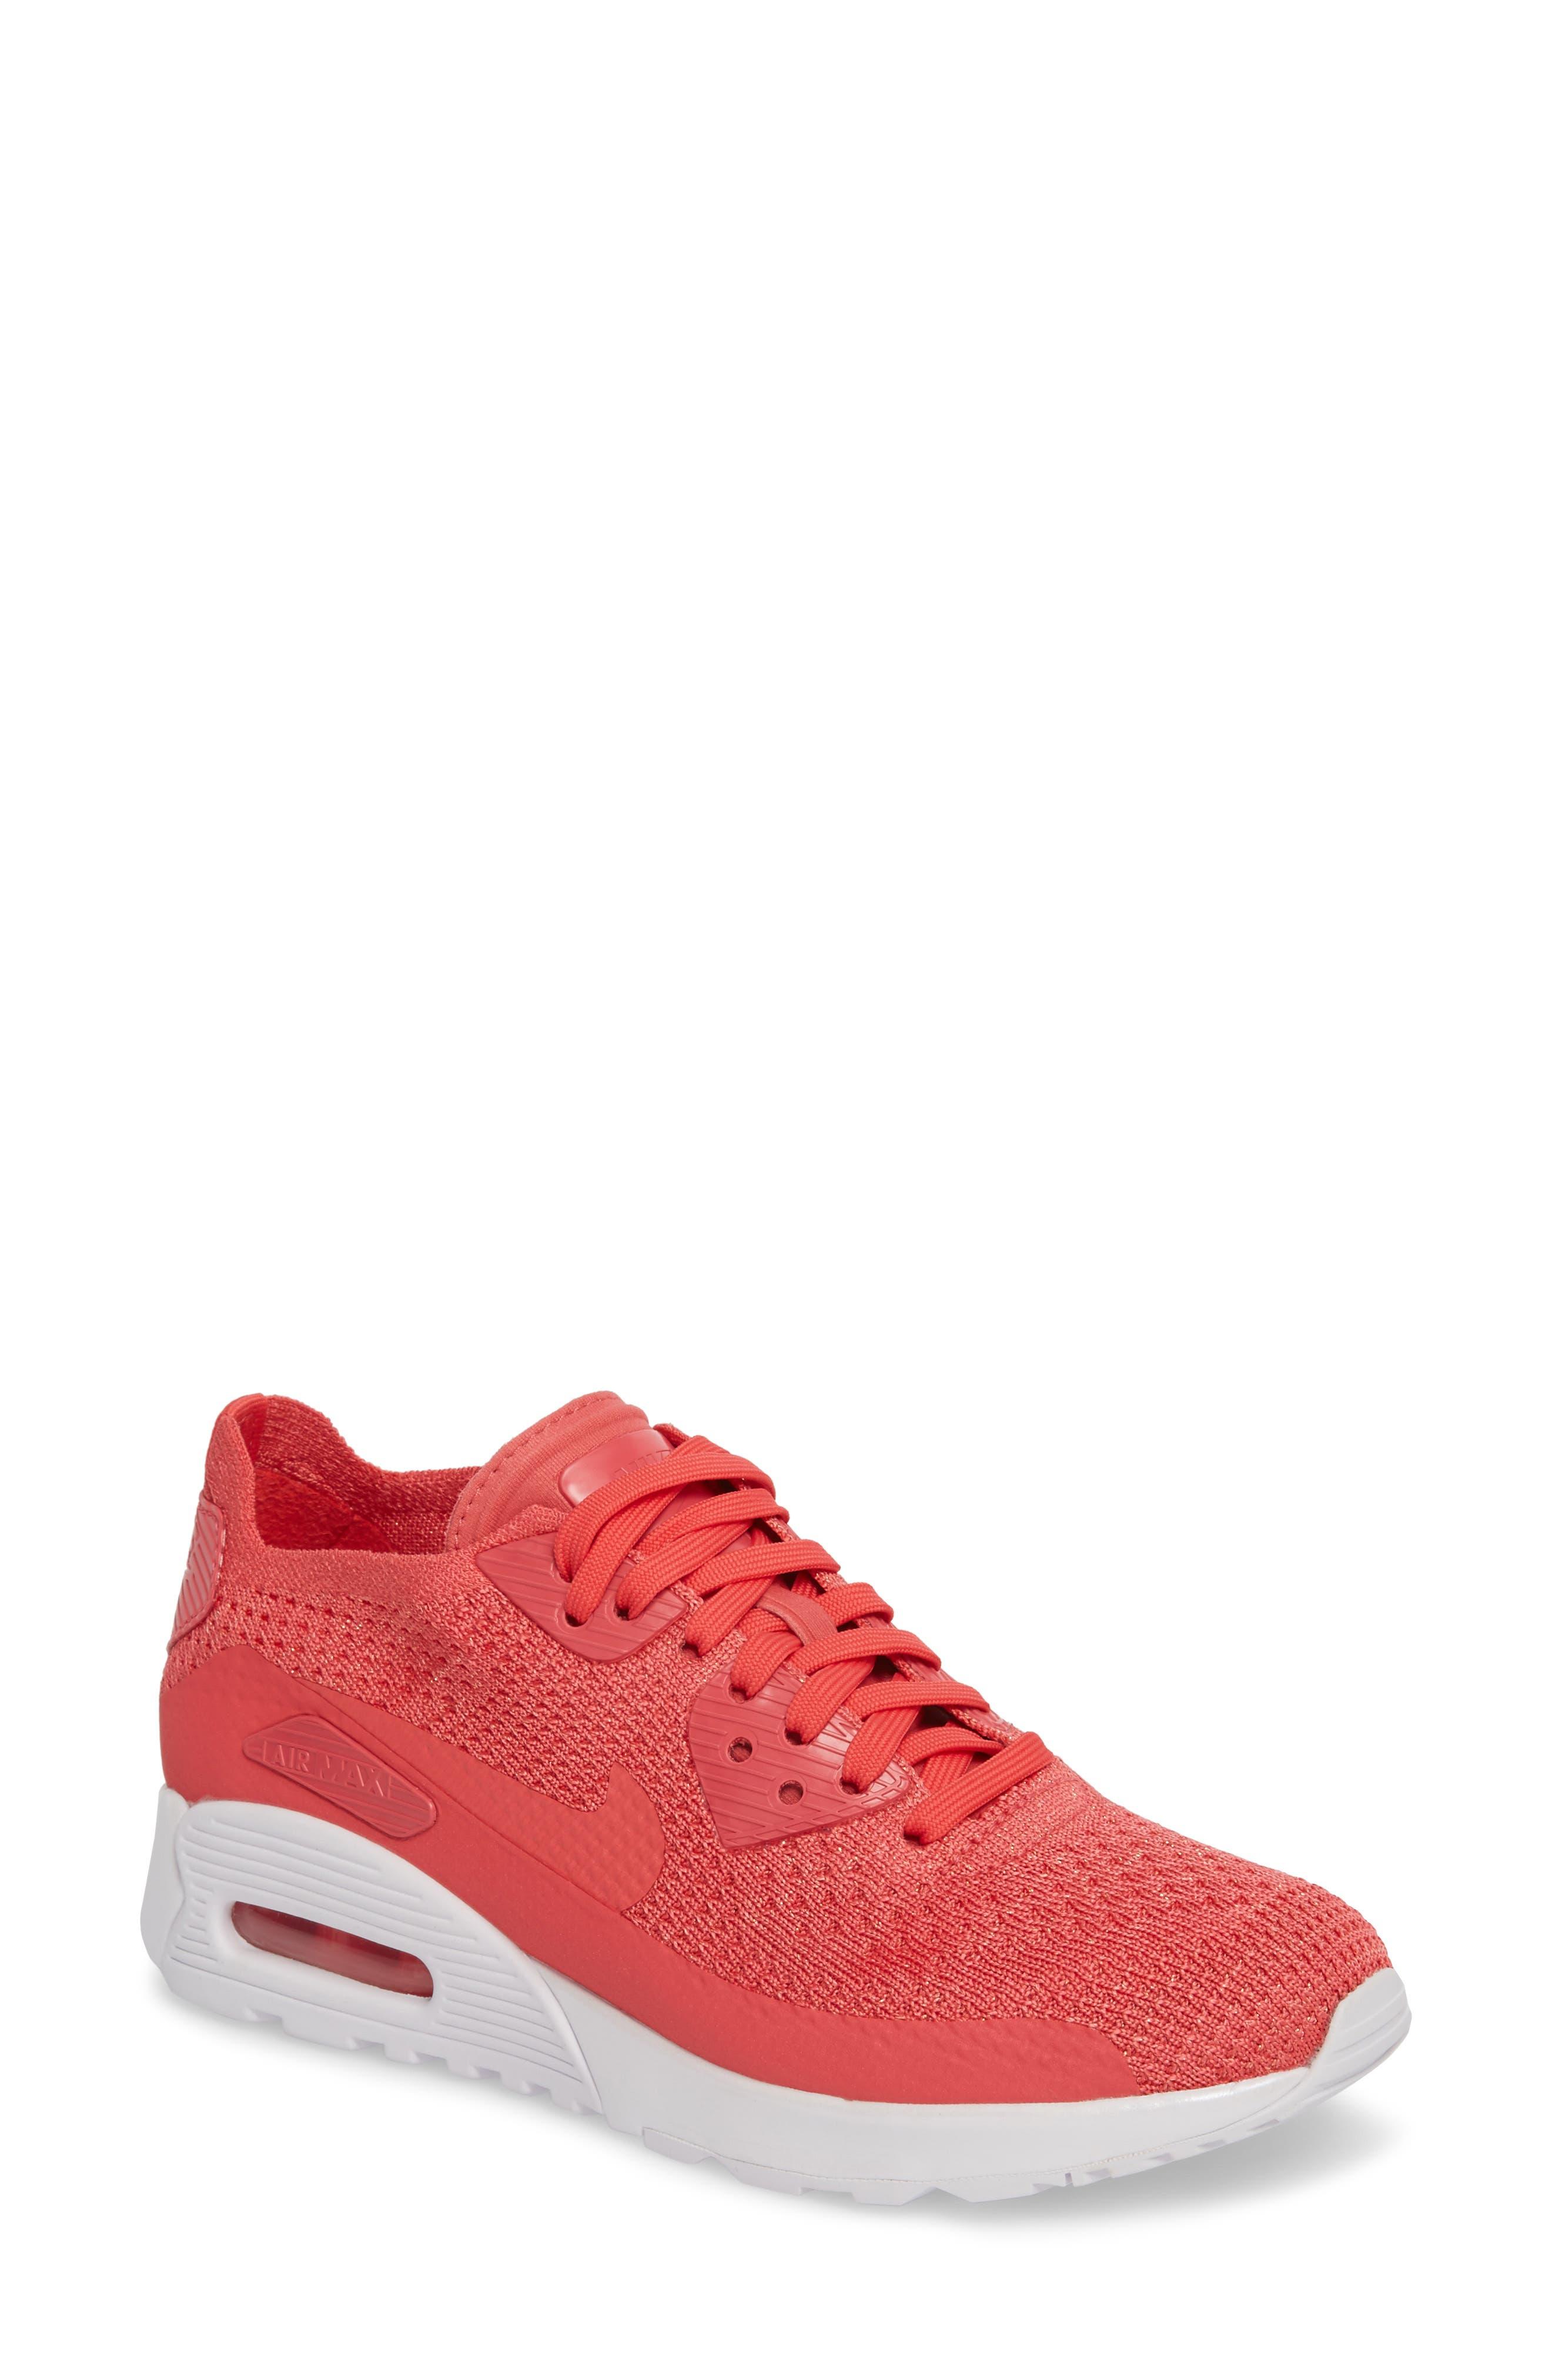 Air Max 90 Flyknit Ultra 2.0 Sneaker,                             Main thumbnail 1, color,                             Geranium/ Geranium